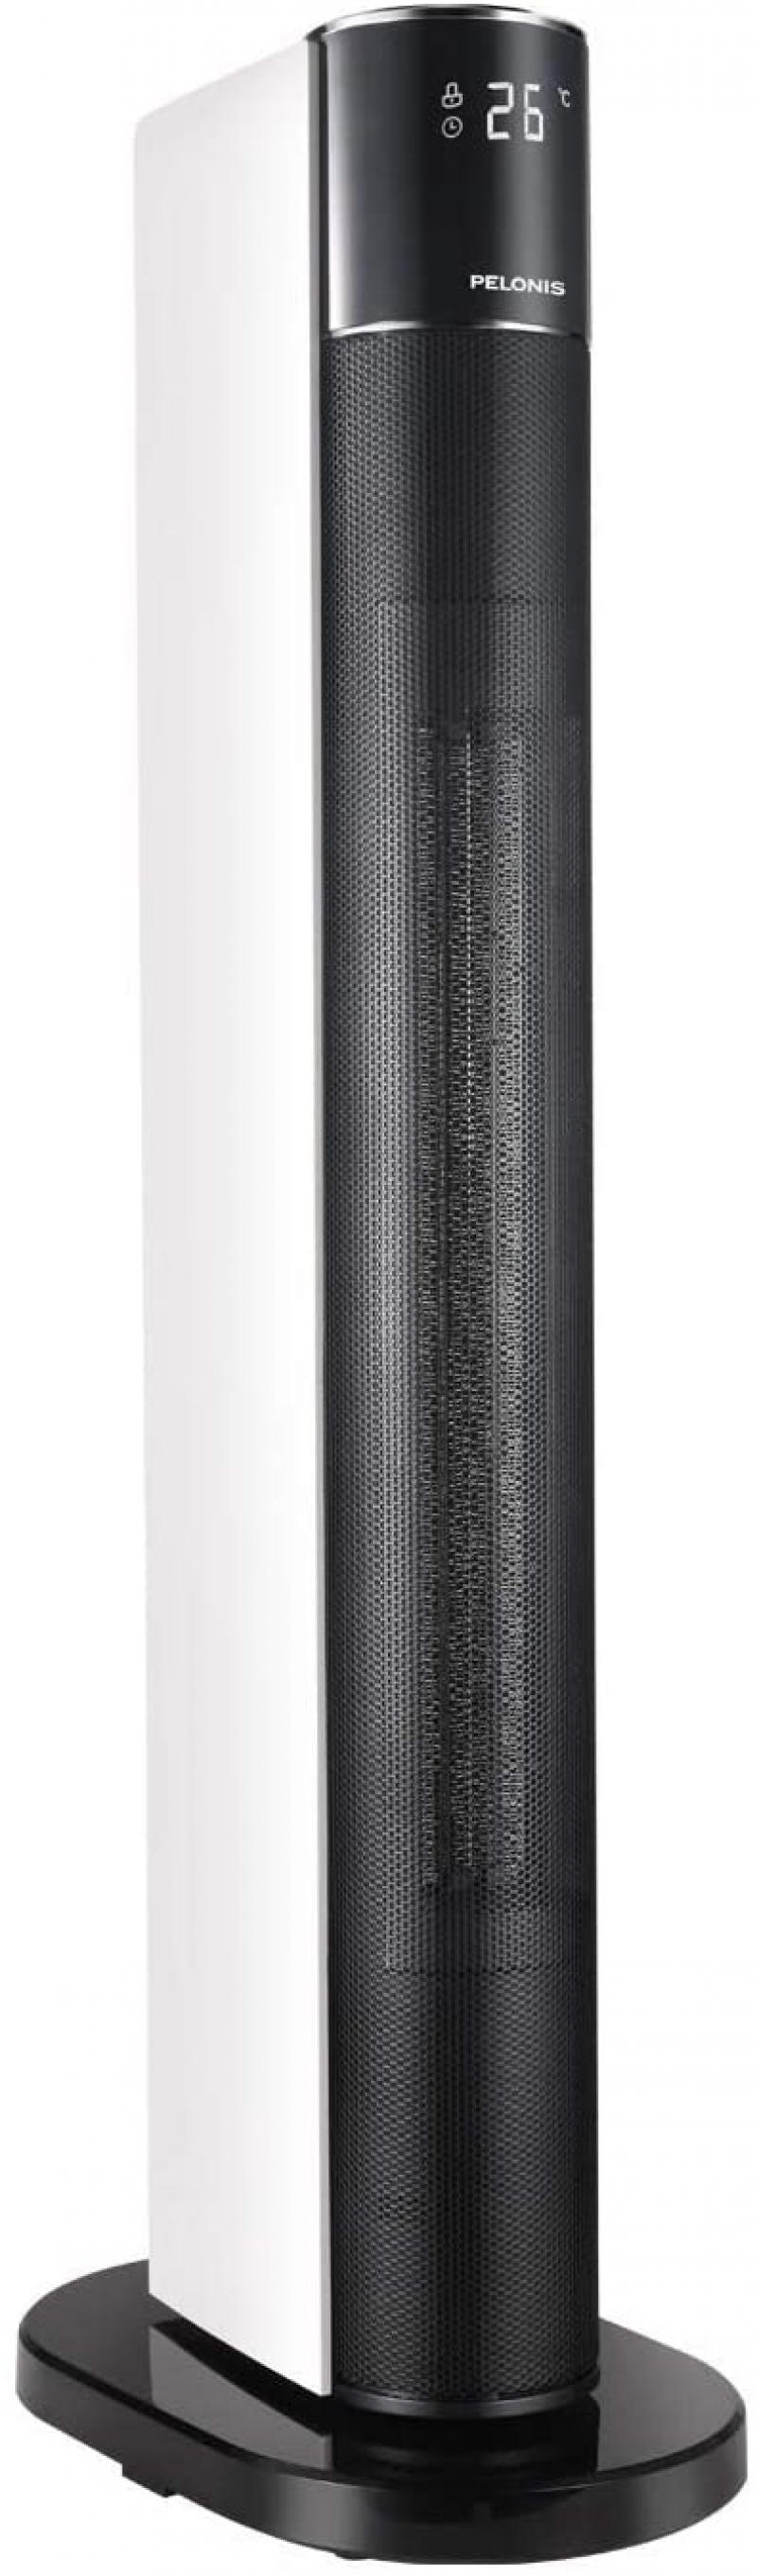 ihocon: PELONIS PHTA8AWB Tower Space Heater, 36.5 x 15.5 x 10 Inches電暖爐